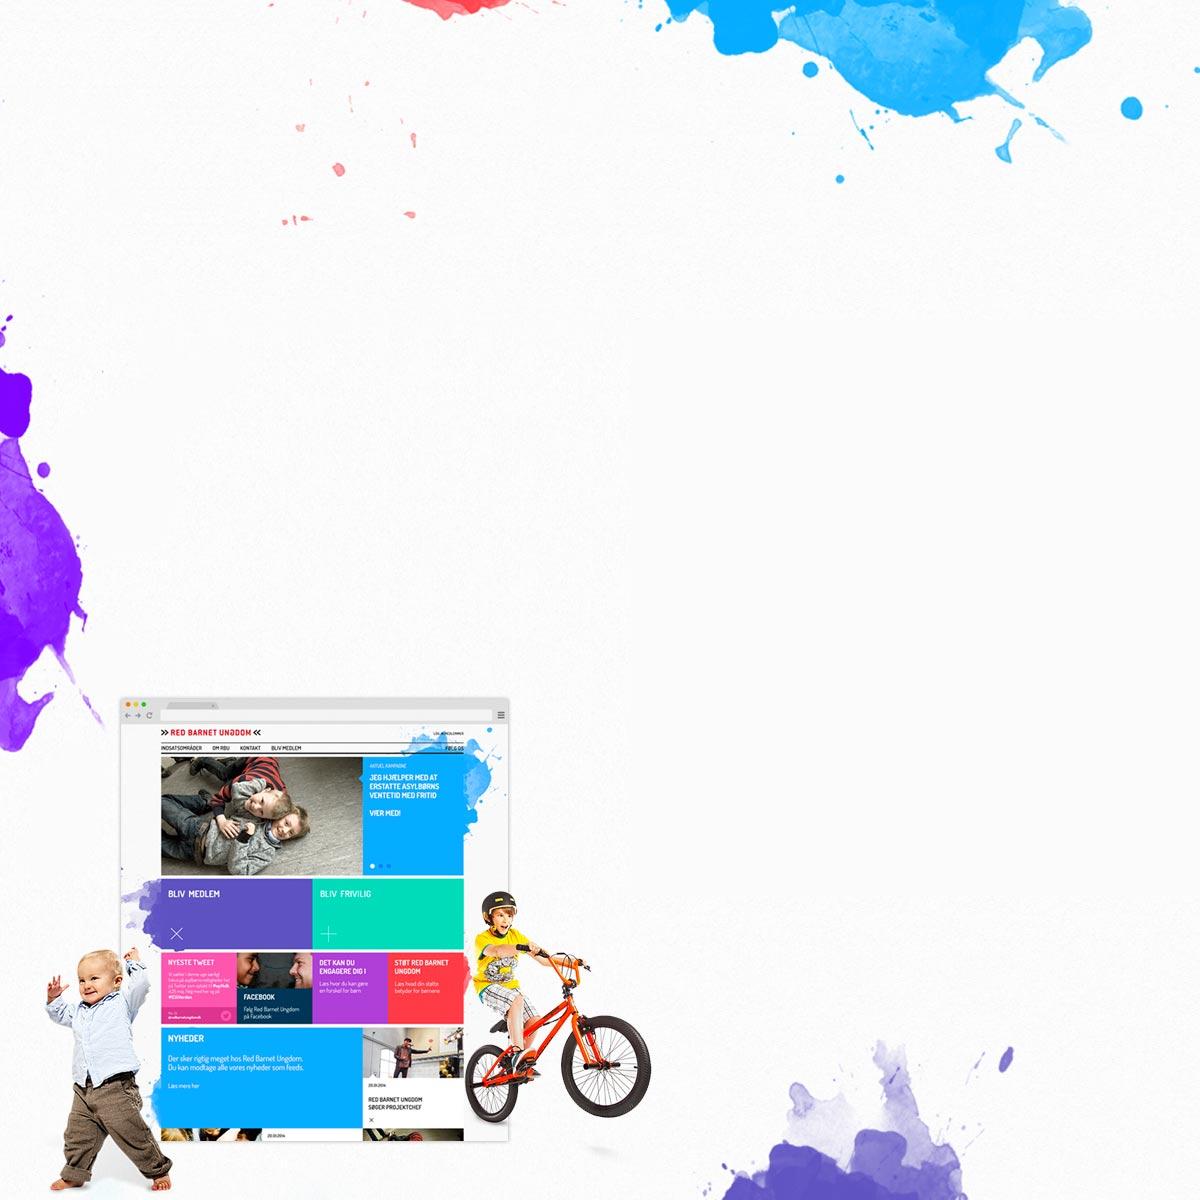 Ny visuel profil til Red Barnet Ungdom